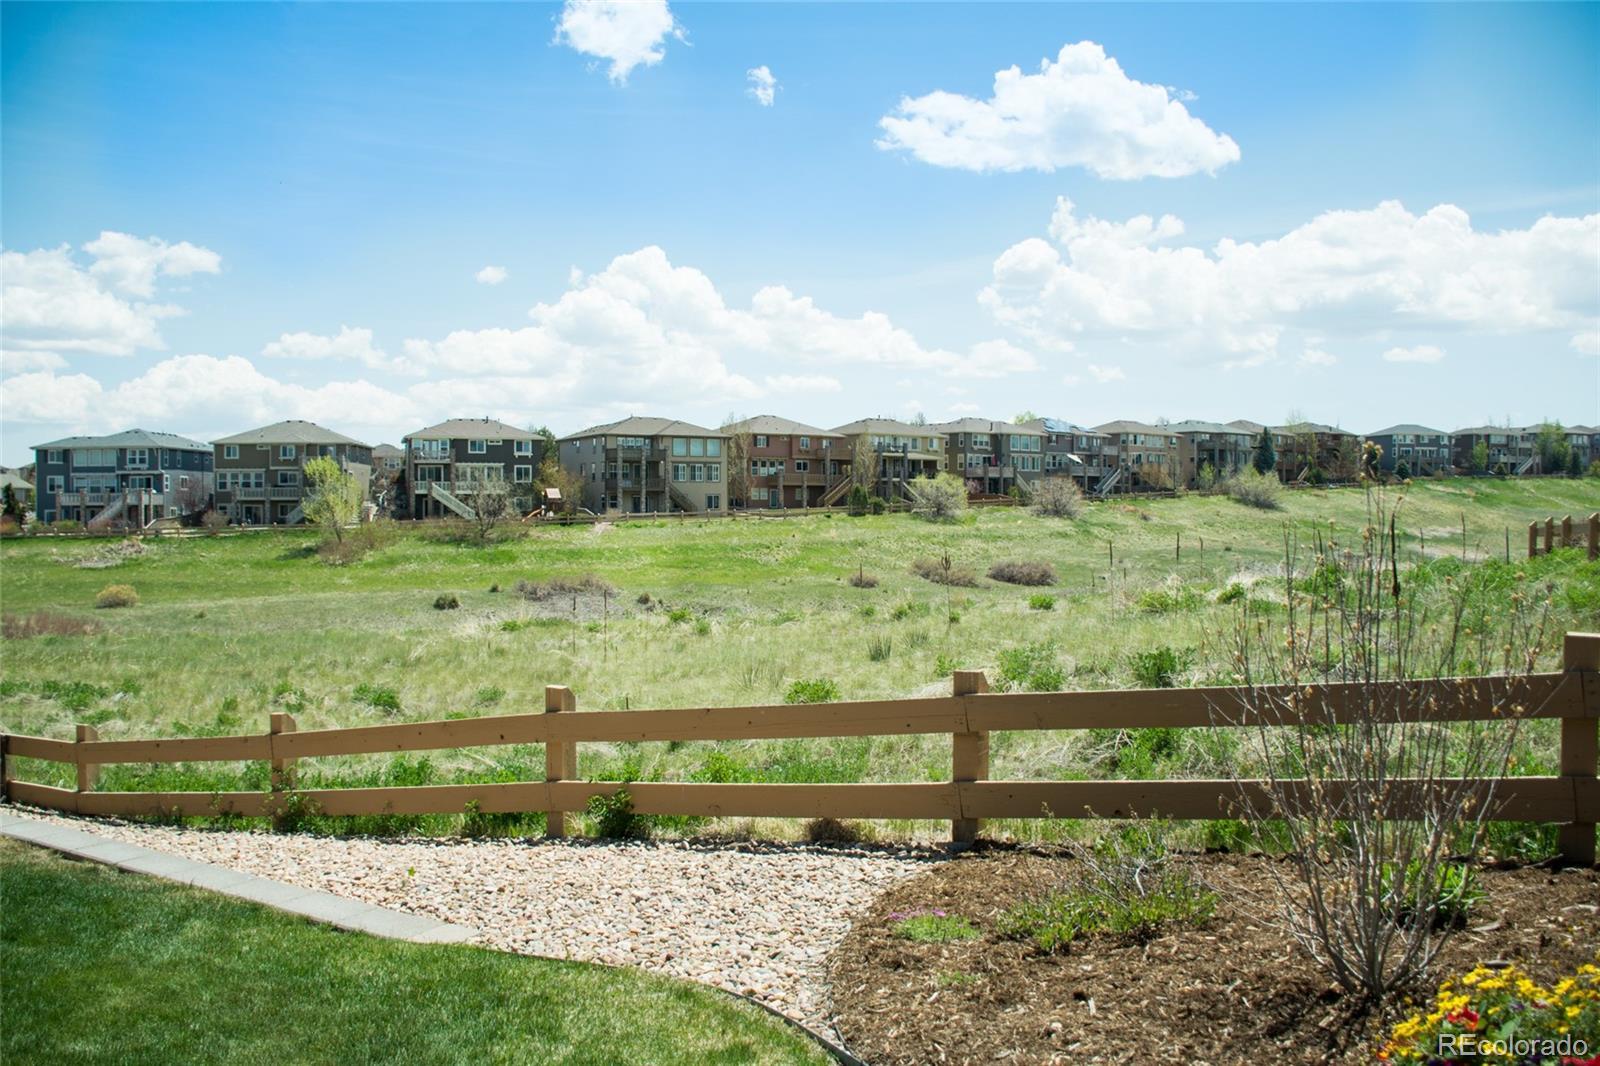 MLS# 6747511 - 23 - 4568 Valleybrook Drive, Highlands Ranch, CO 80130